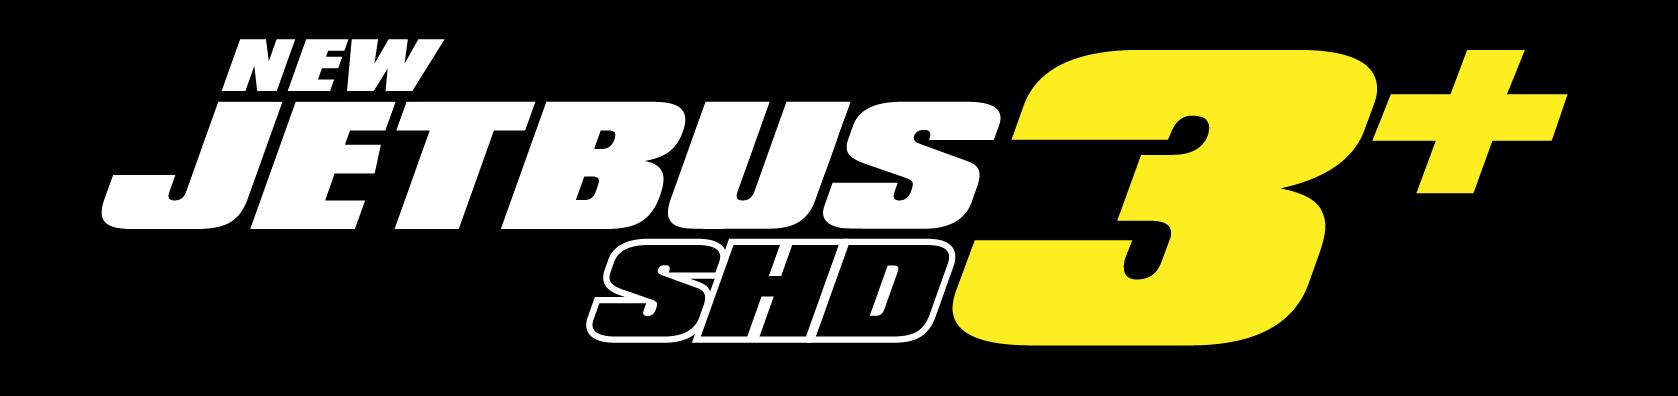 Jetbus SHD 3+